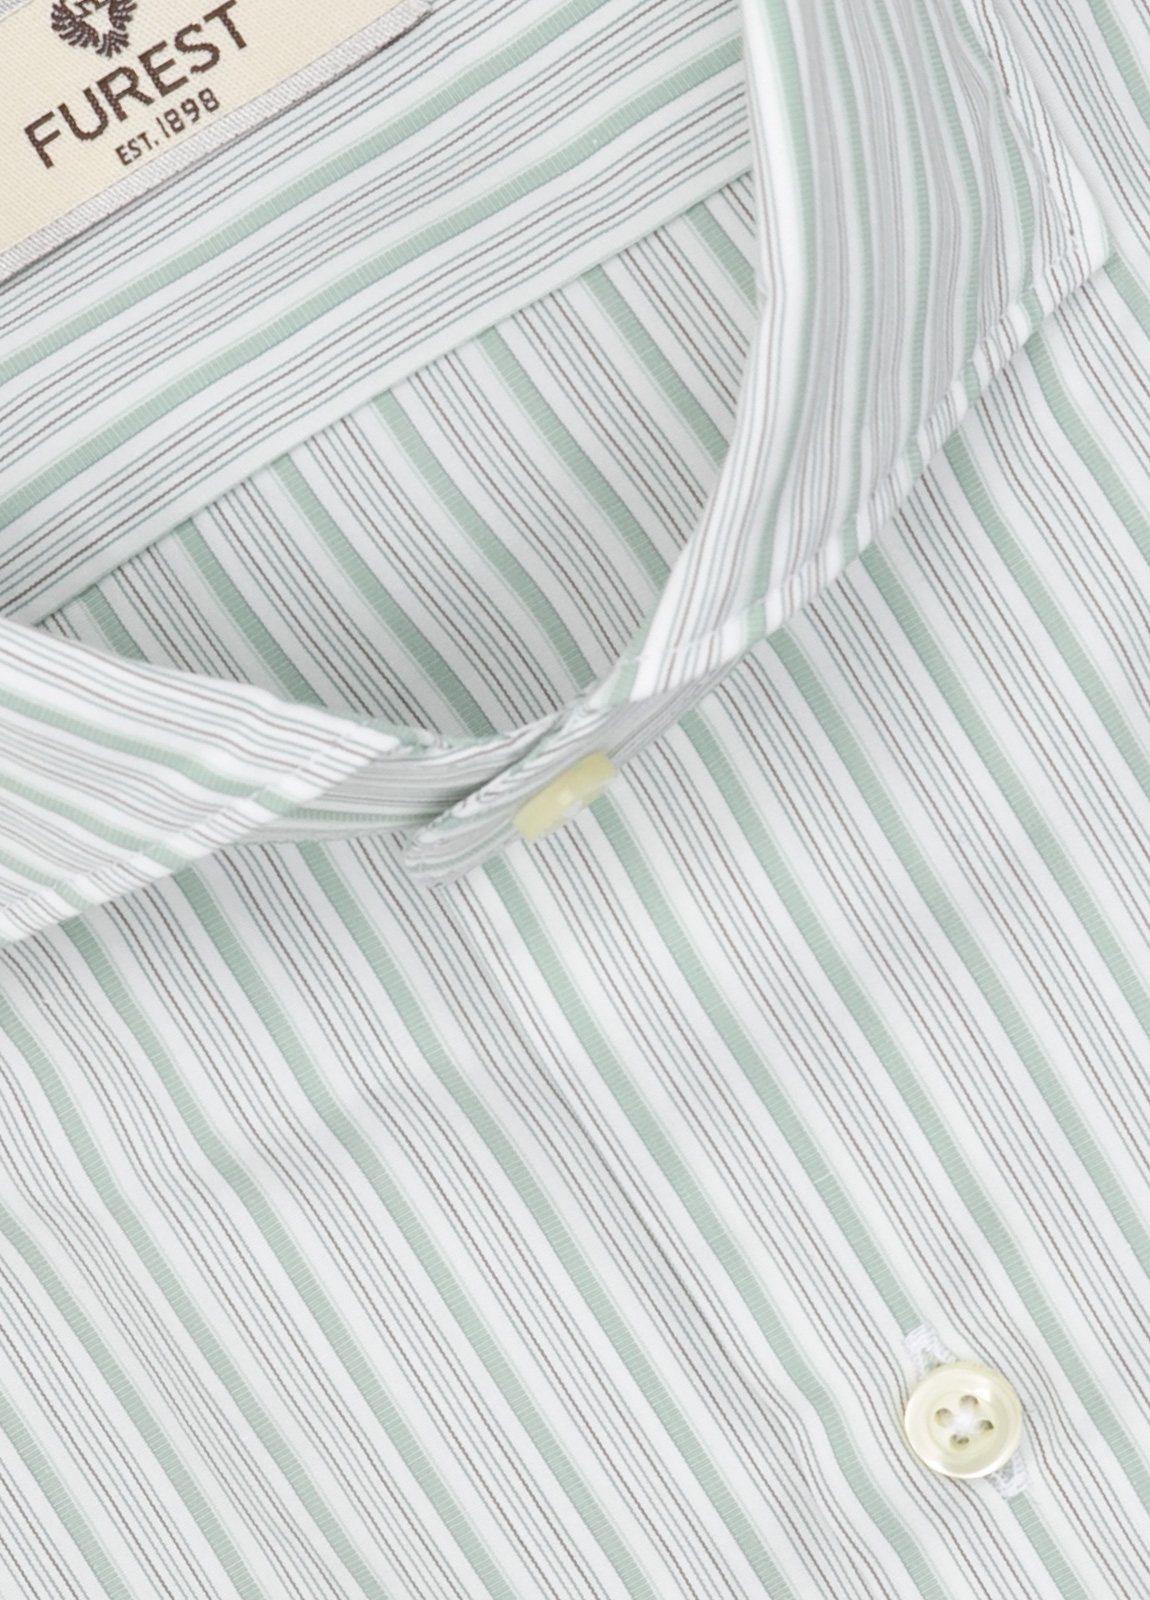 Camisa Leisure Wear SLIM FIT Modelo CAPRI, rayas verde, gris, 100% Algodón. - Ítem1